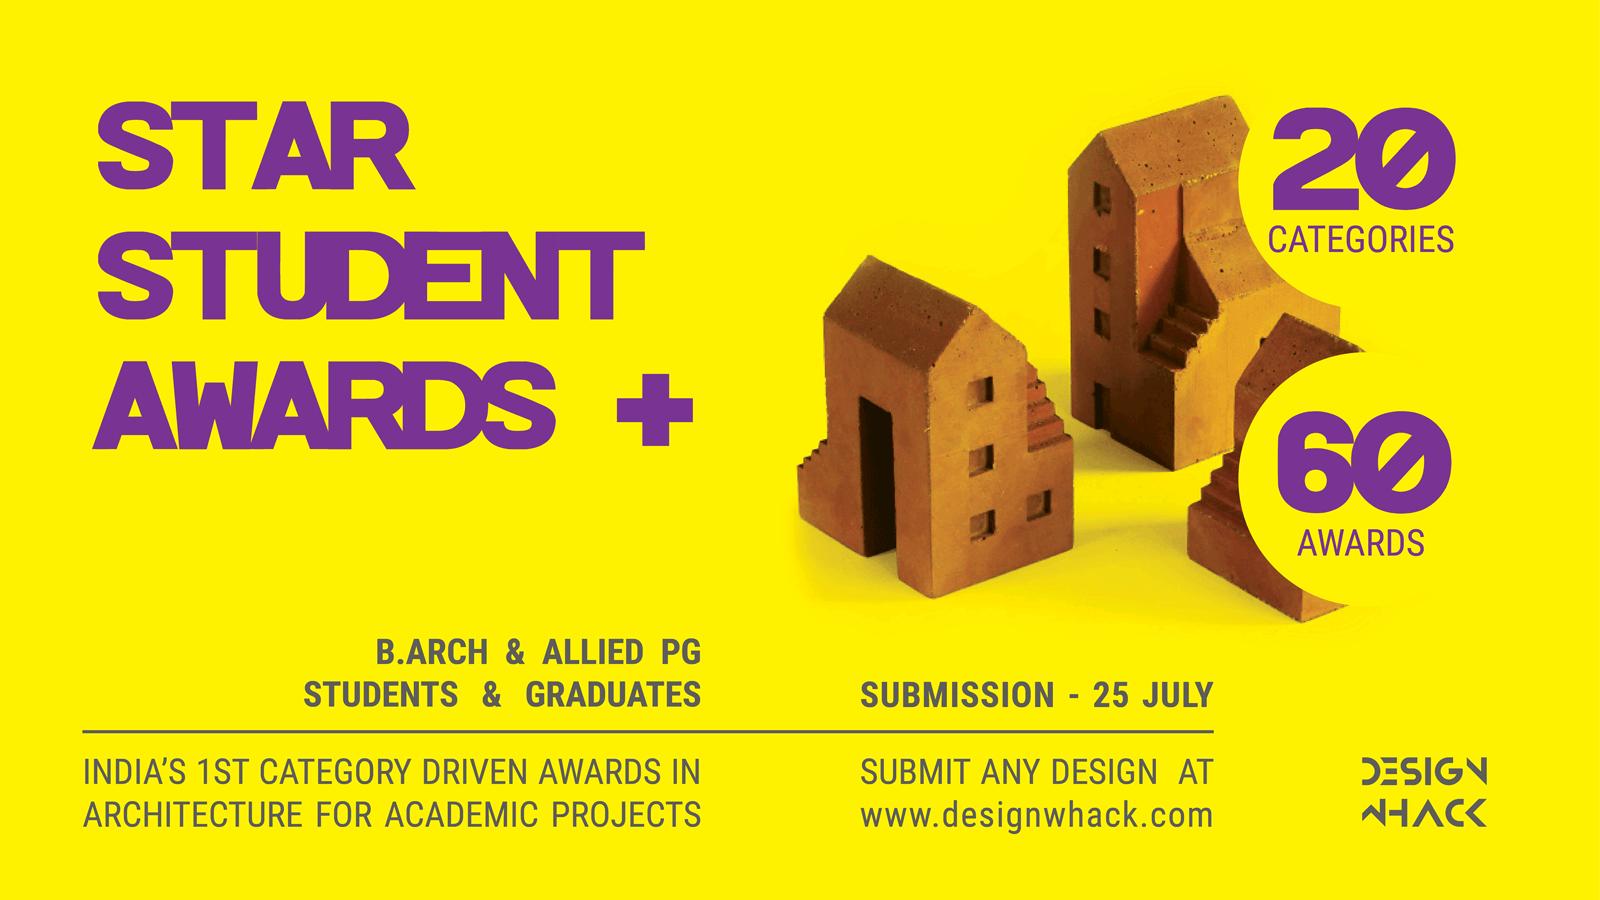 Star Student Awards   UG PG Students   Recent Graduates   Architecture